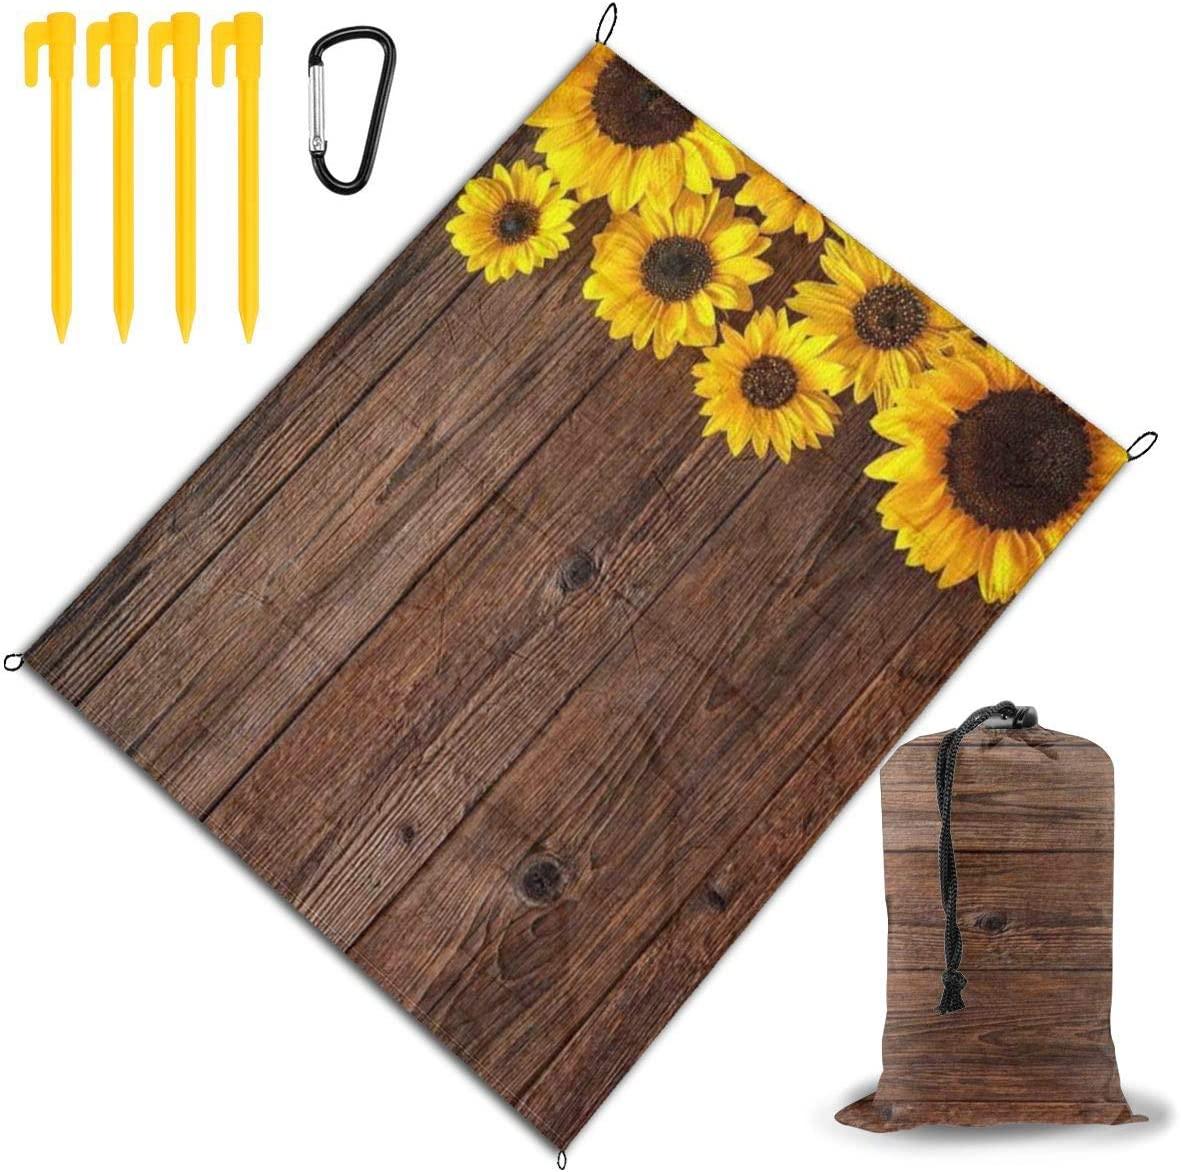 JEKYDOSD Sunflower Plank Printed Picnic Mat,Travel Outdoor Beach Blanket Durable Waterproof Sand Beach Mat Blanket for Travel Camping Hiking 67